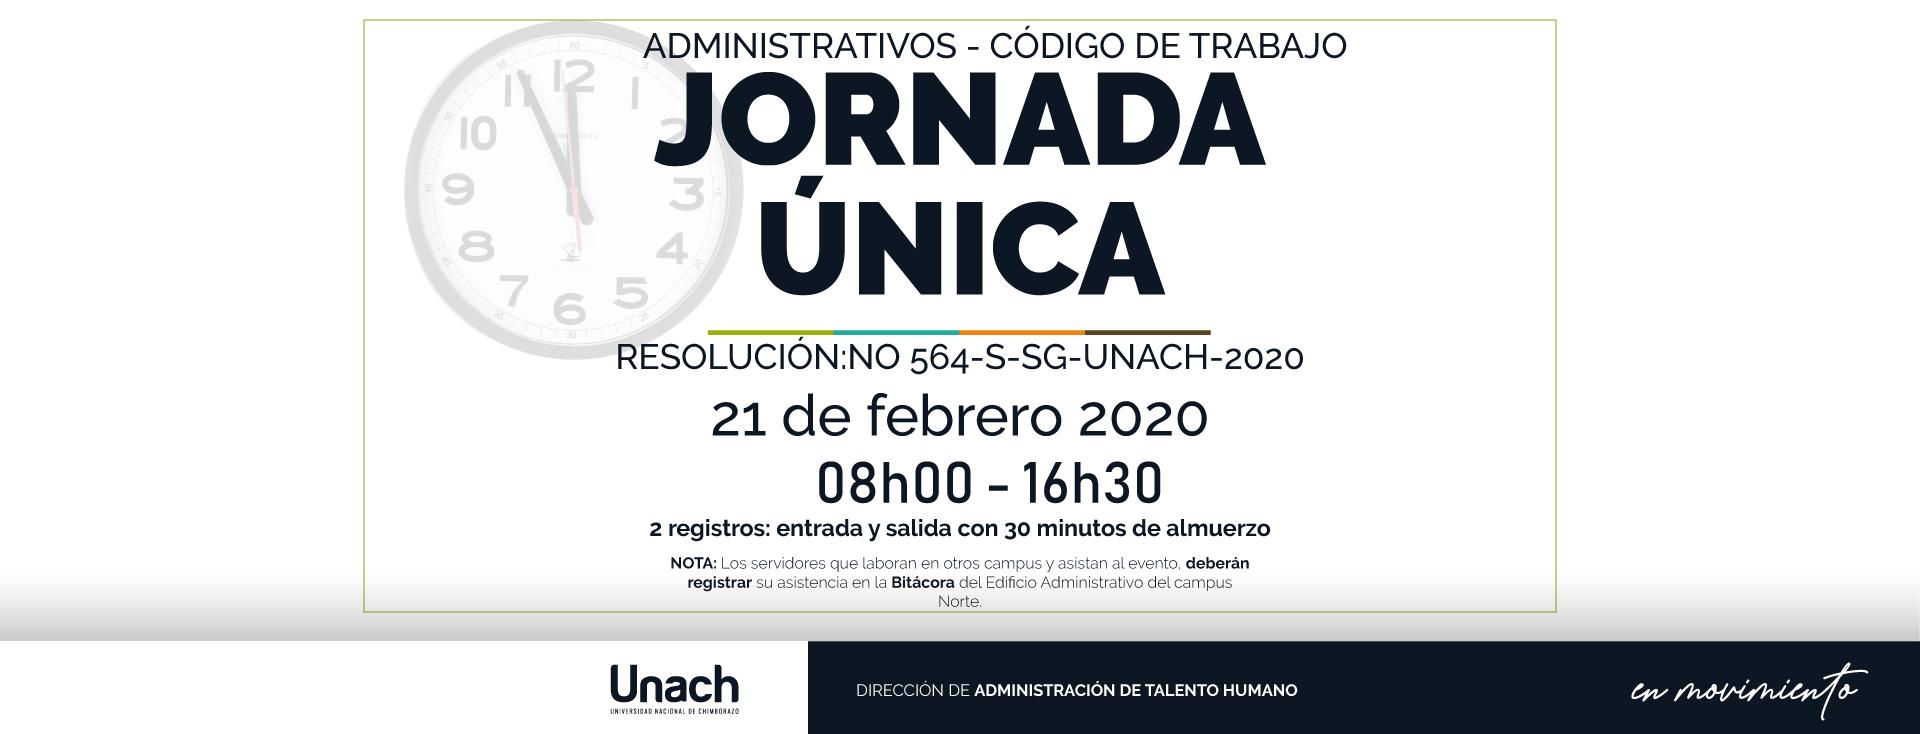 JORNADA ÚNICA CARNAVAL UNIVERSITARIO 2020